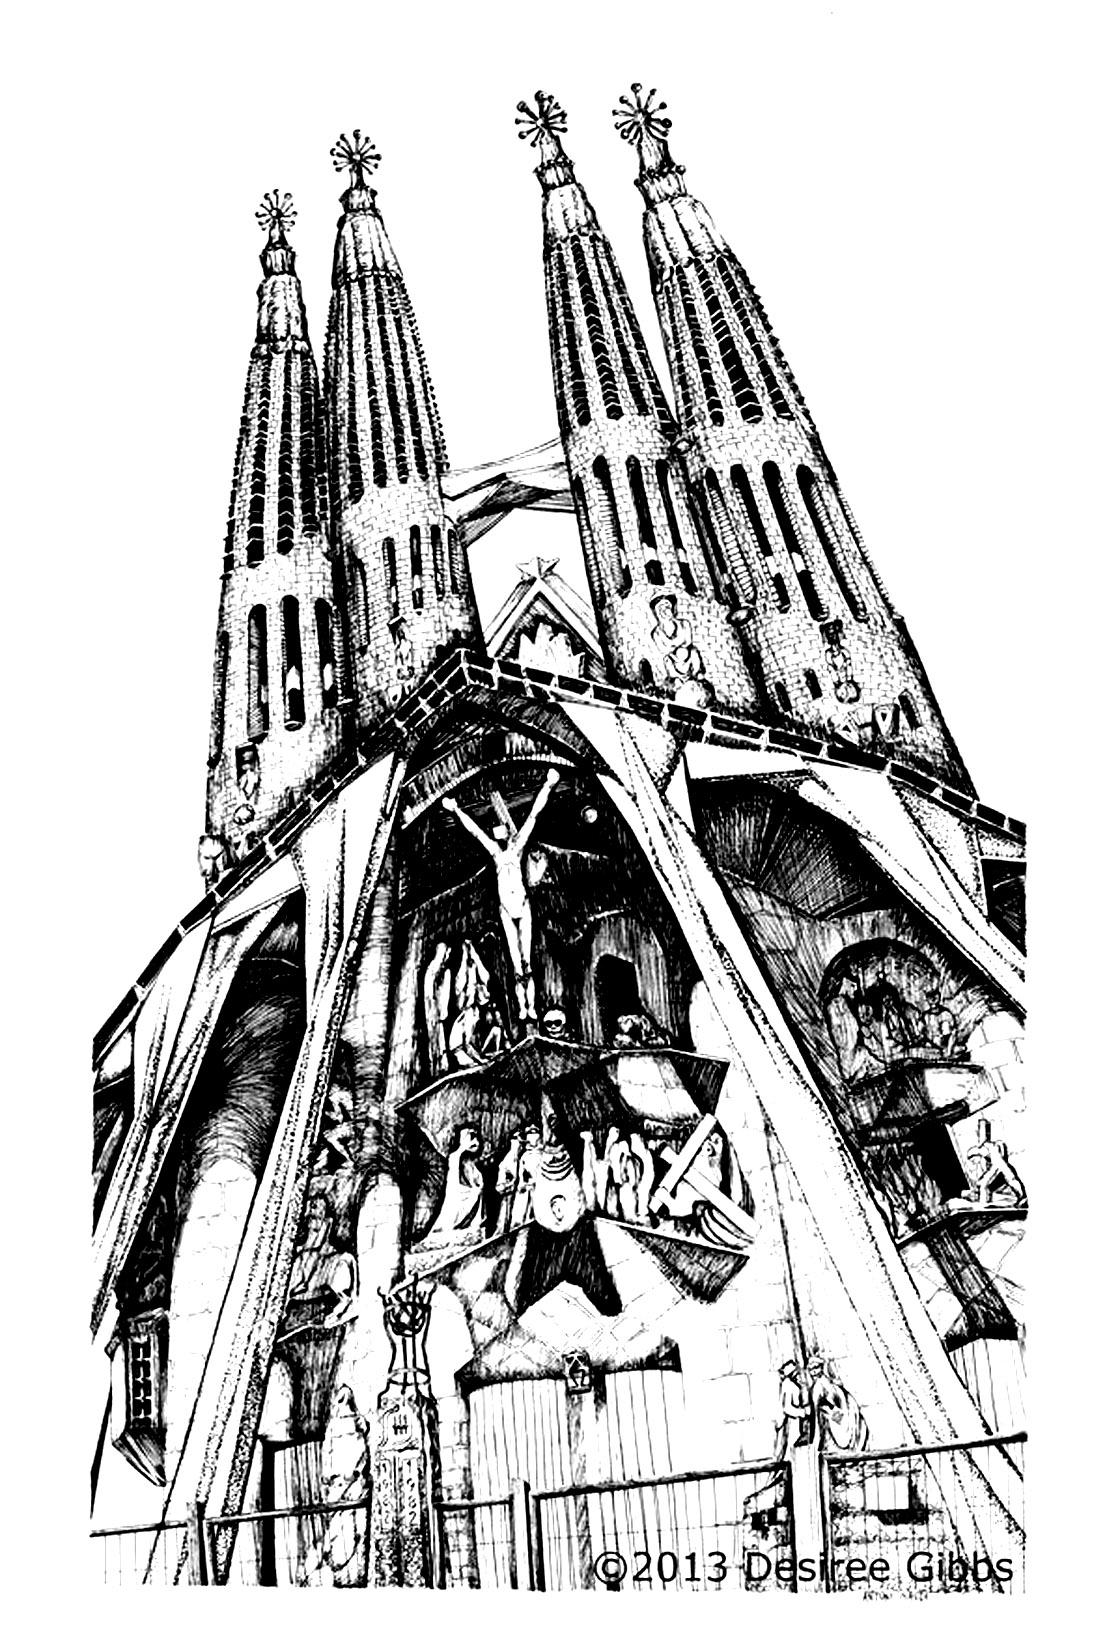 Dessin de la célèbre cathédrale inachevée de Gauidi : la Sagrada Familia à Barcelone